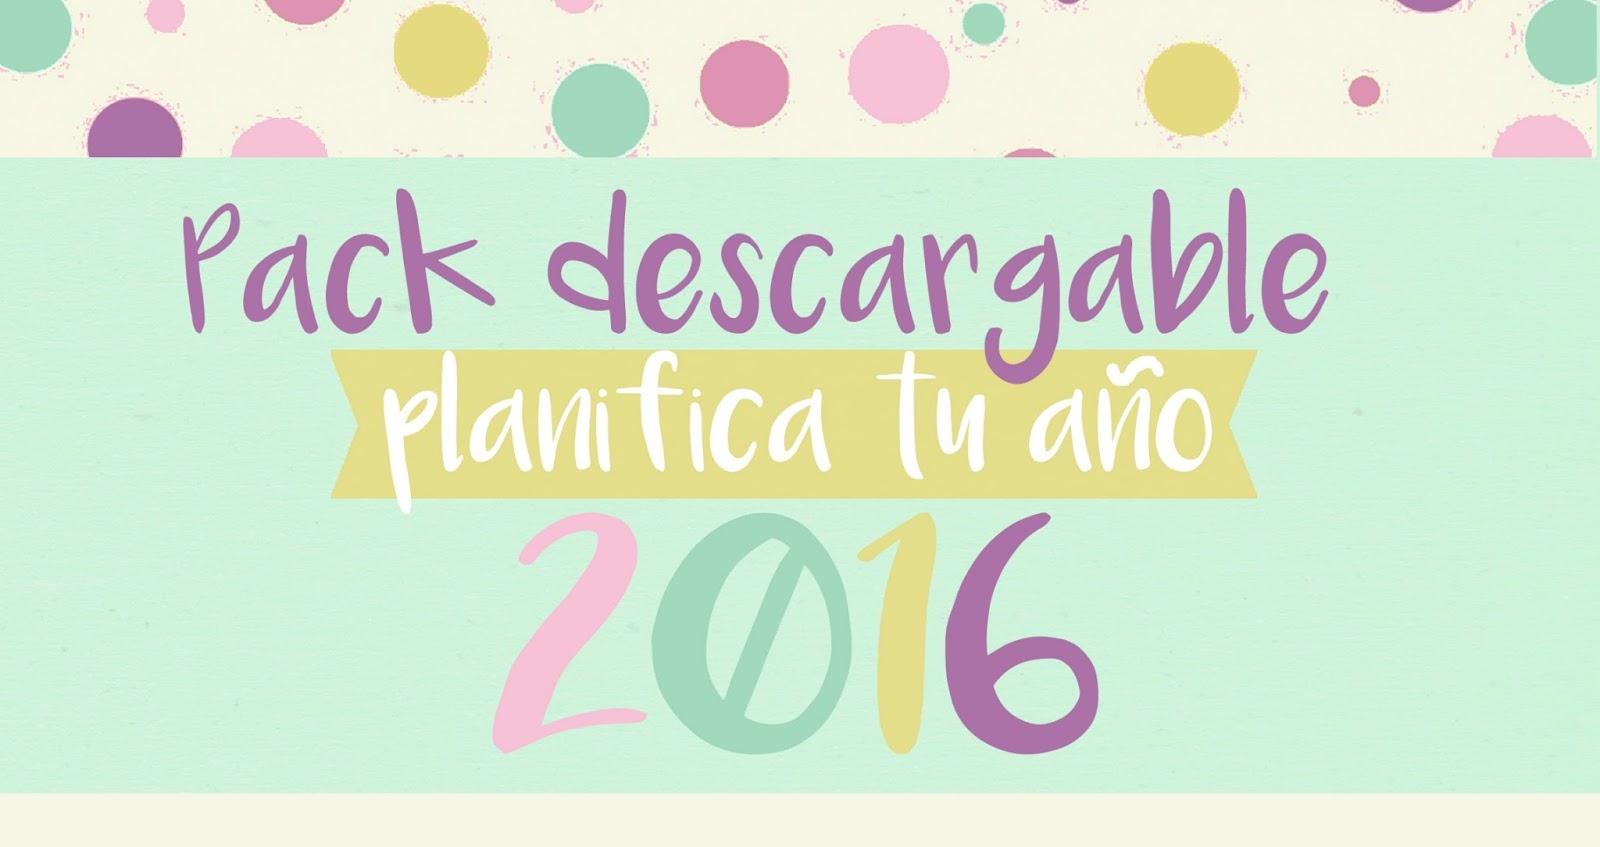 Descargables: Pack Planifica Tu Año 2016 Con Agenda